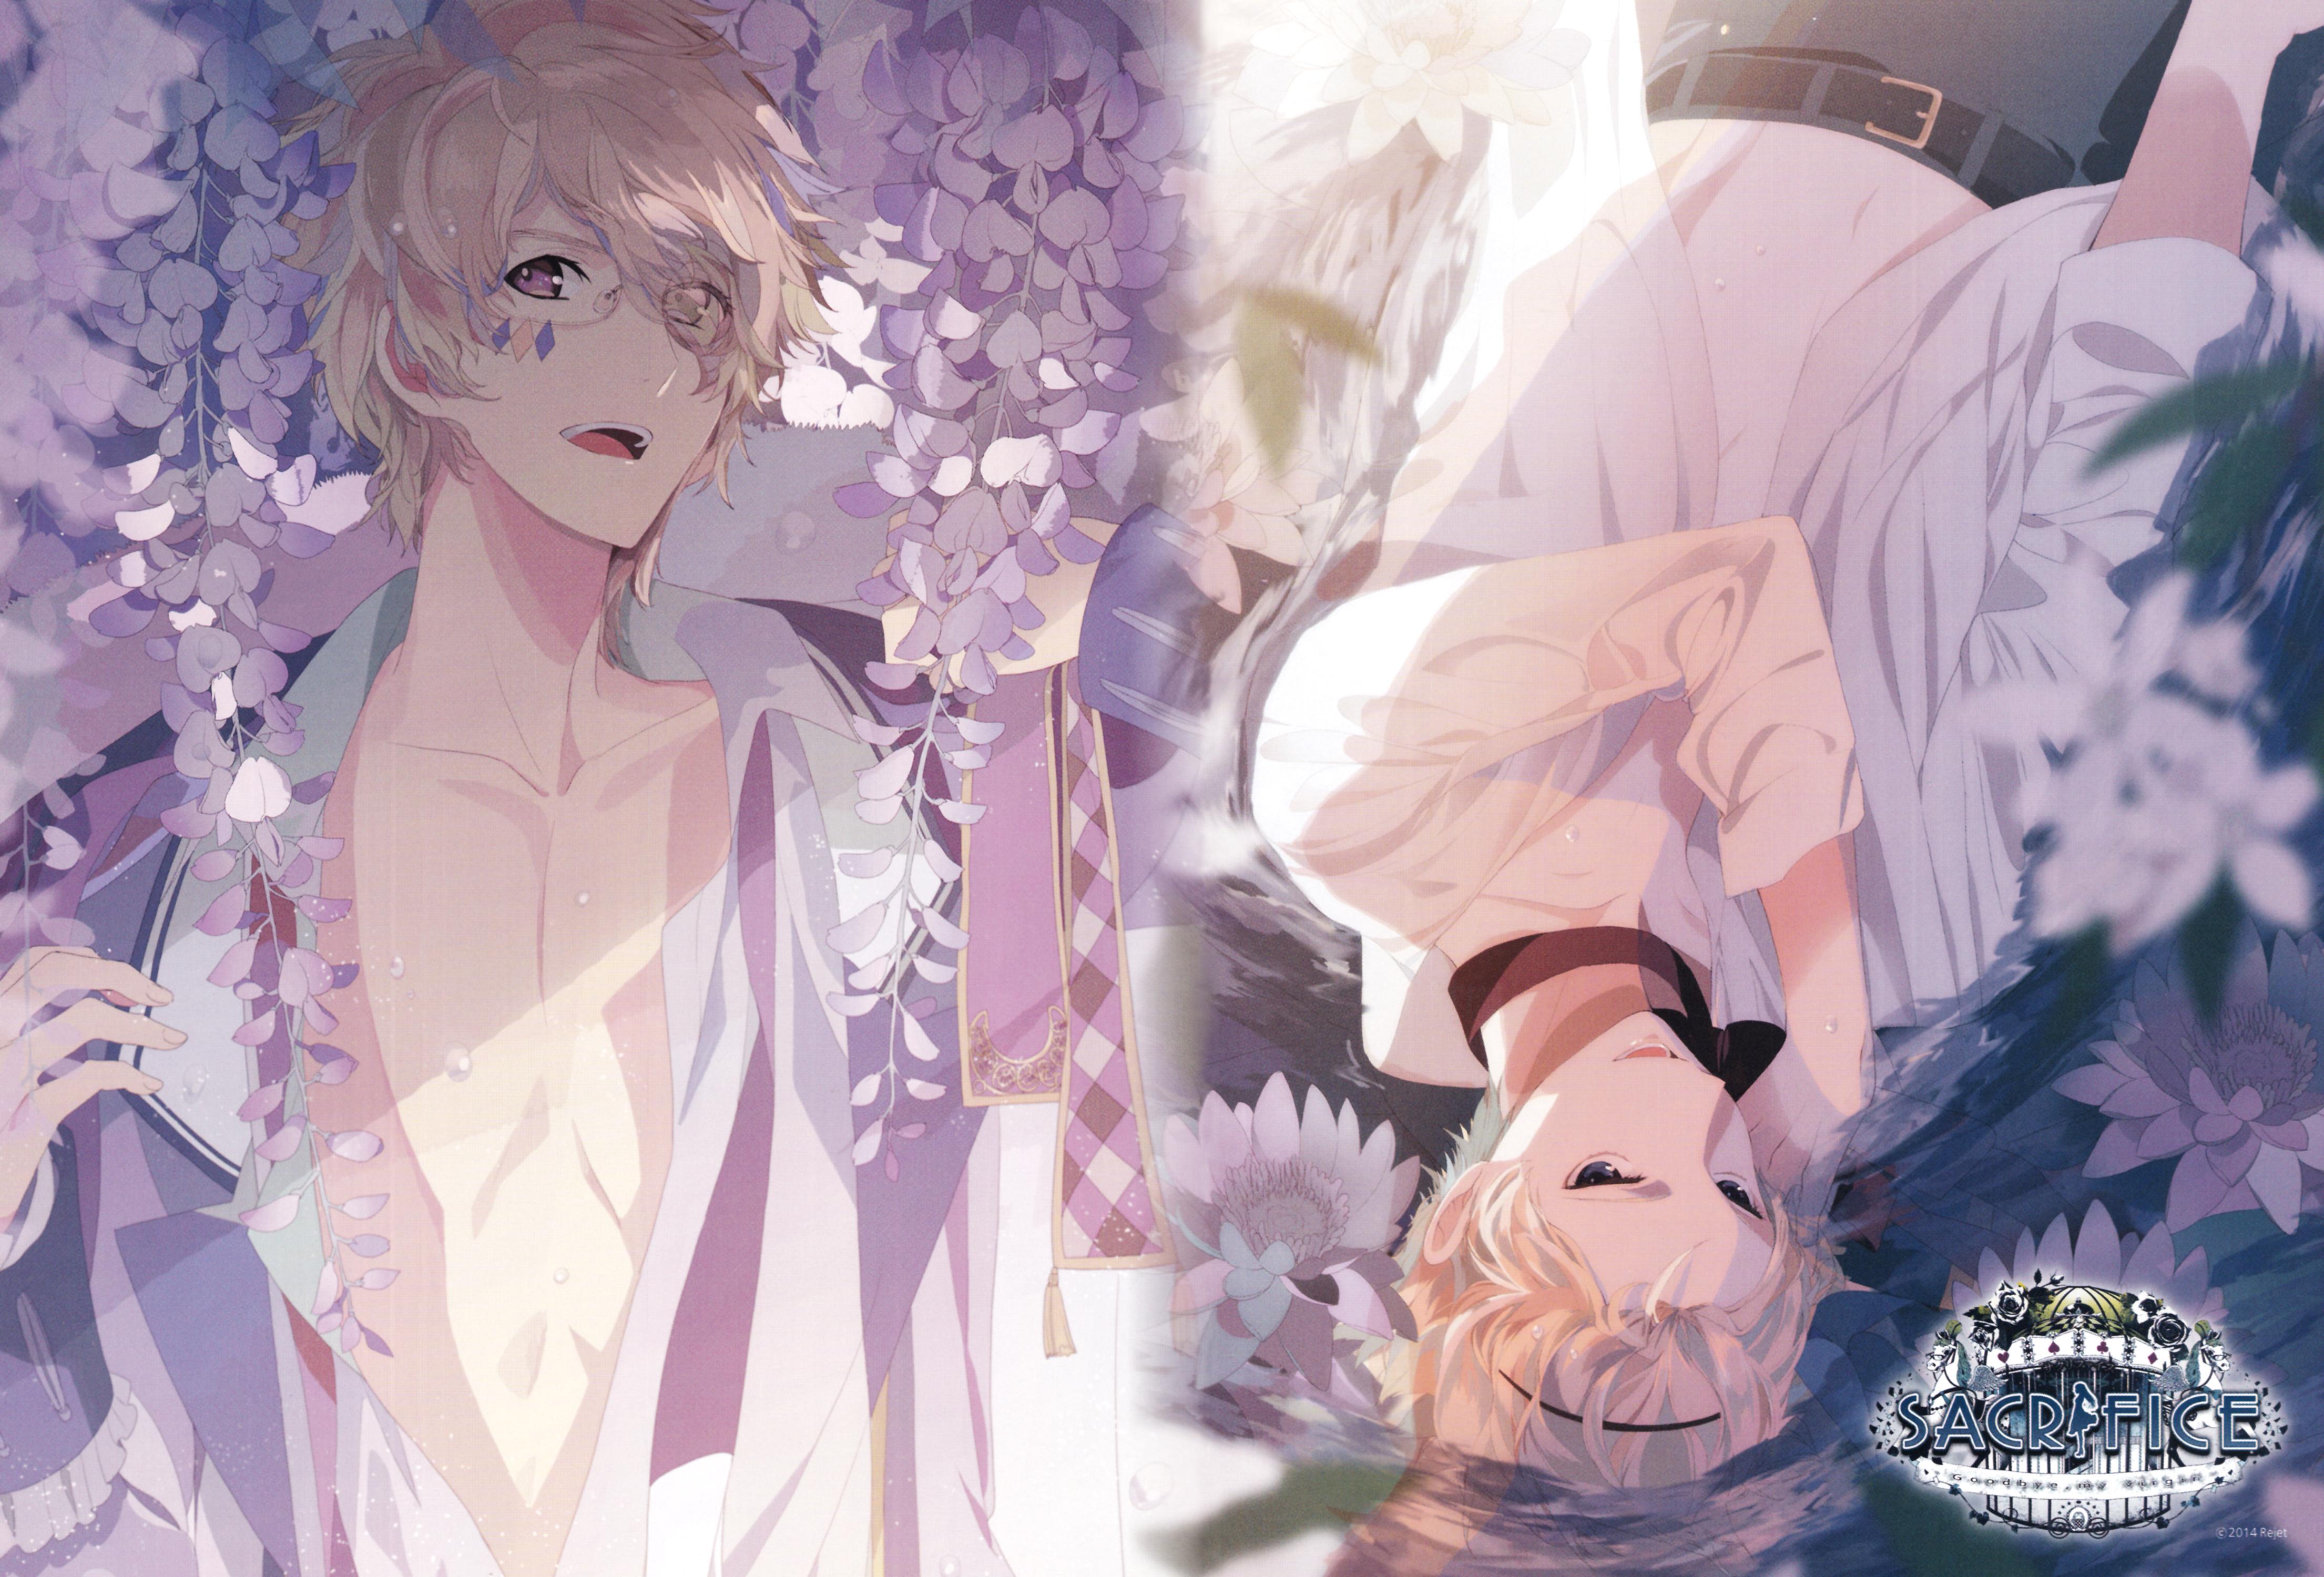 SACRIFICE (Drama CD) Image #1816192 - Zerochan Anime Image Board